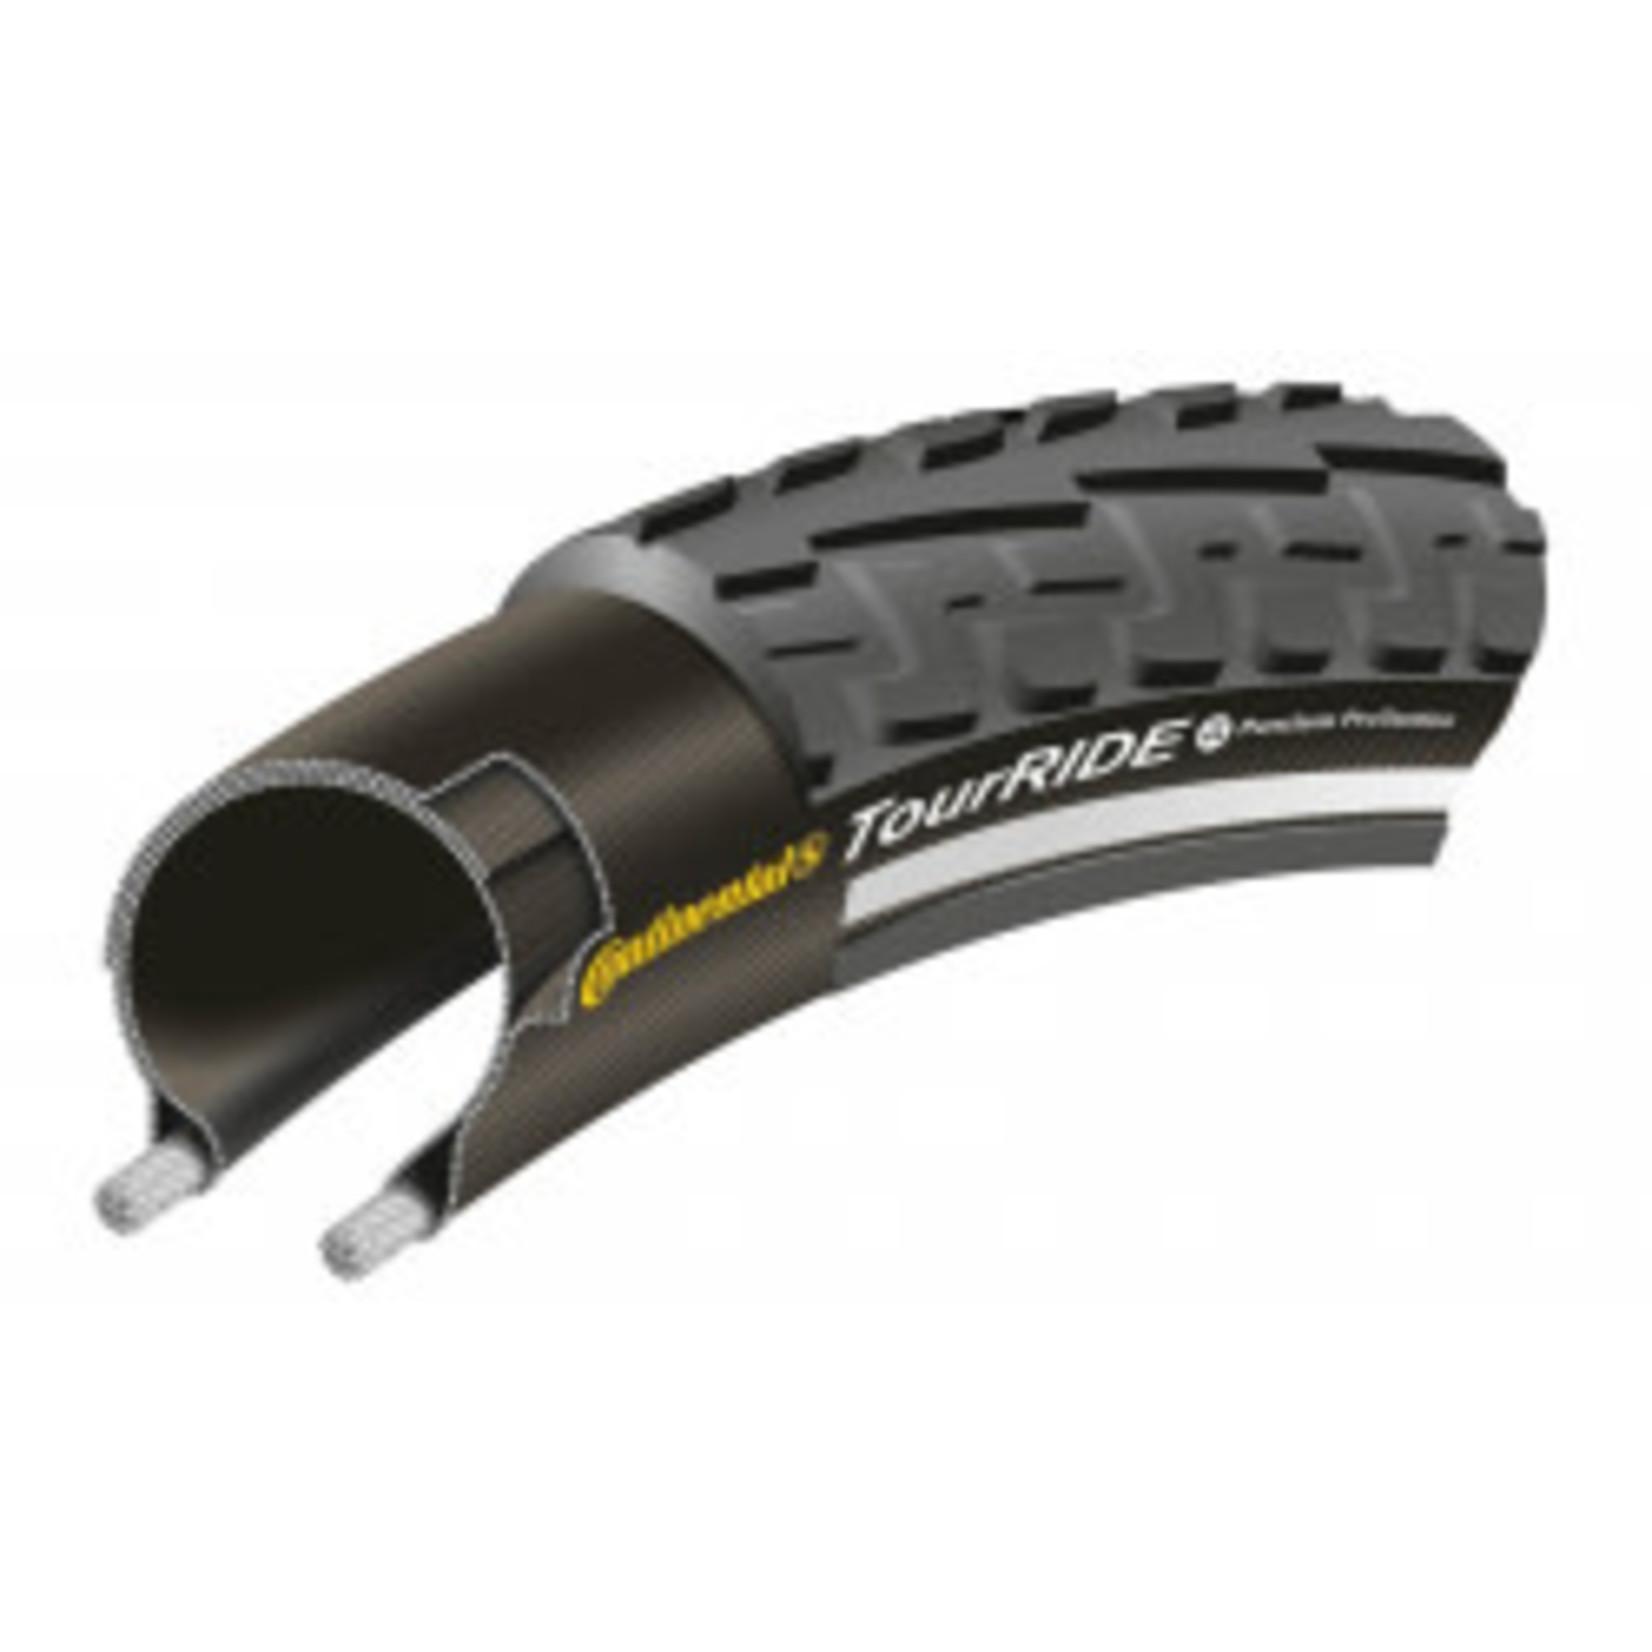 CONTINENTAL Continental - Reifen Tour Ride Reflex 650B 27.5x1.6